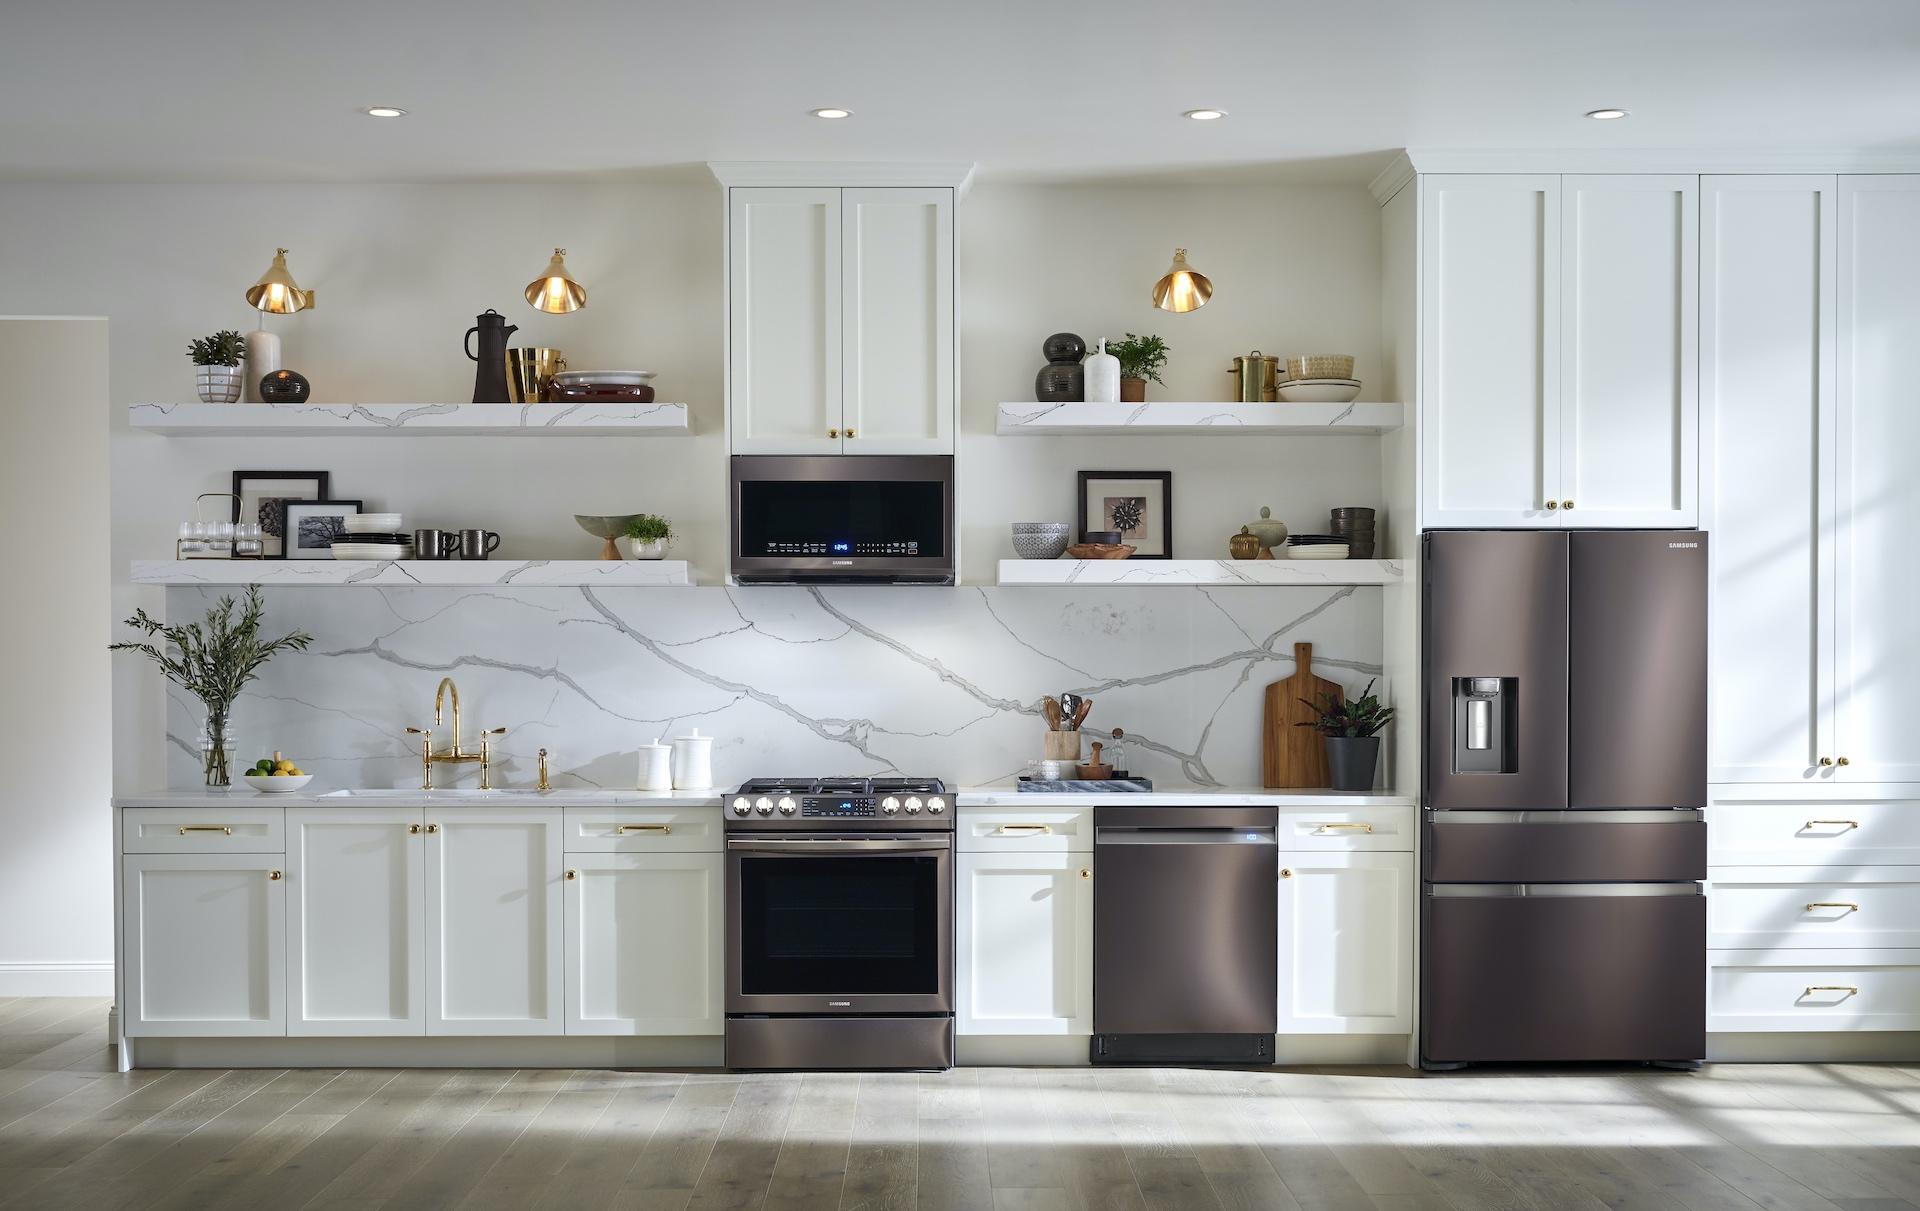 9 Ways COVID-19 Will Change Kitchen Design Trends In 2020